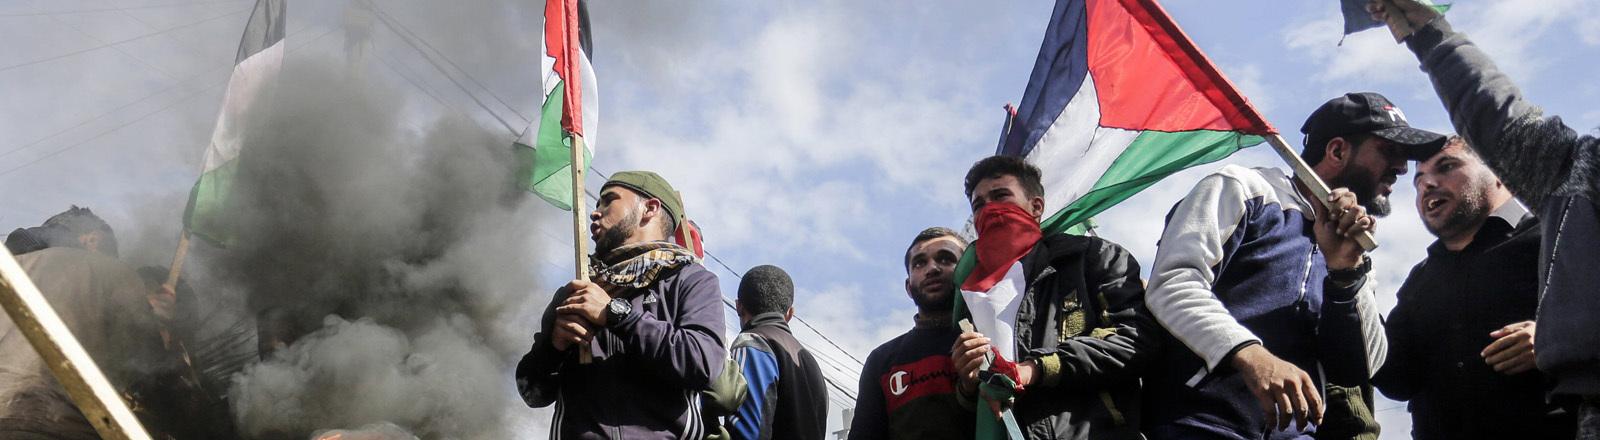 Proteste in Gaza Stadt gegen Donald Trumps Nahost-Plan am 28.1.2020